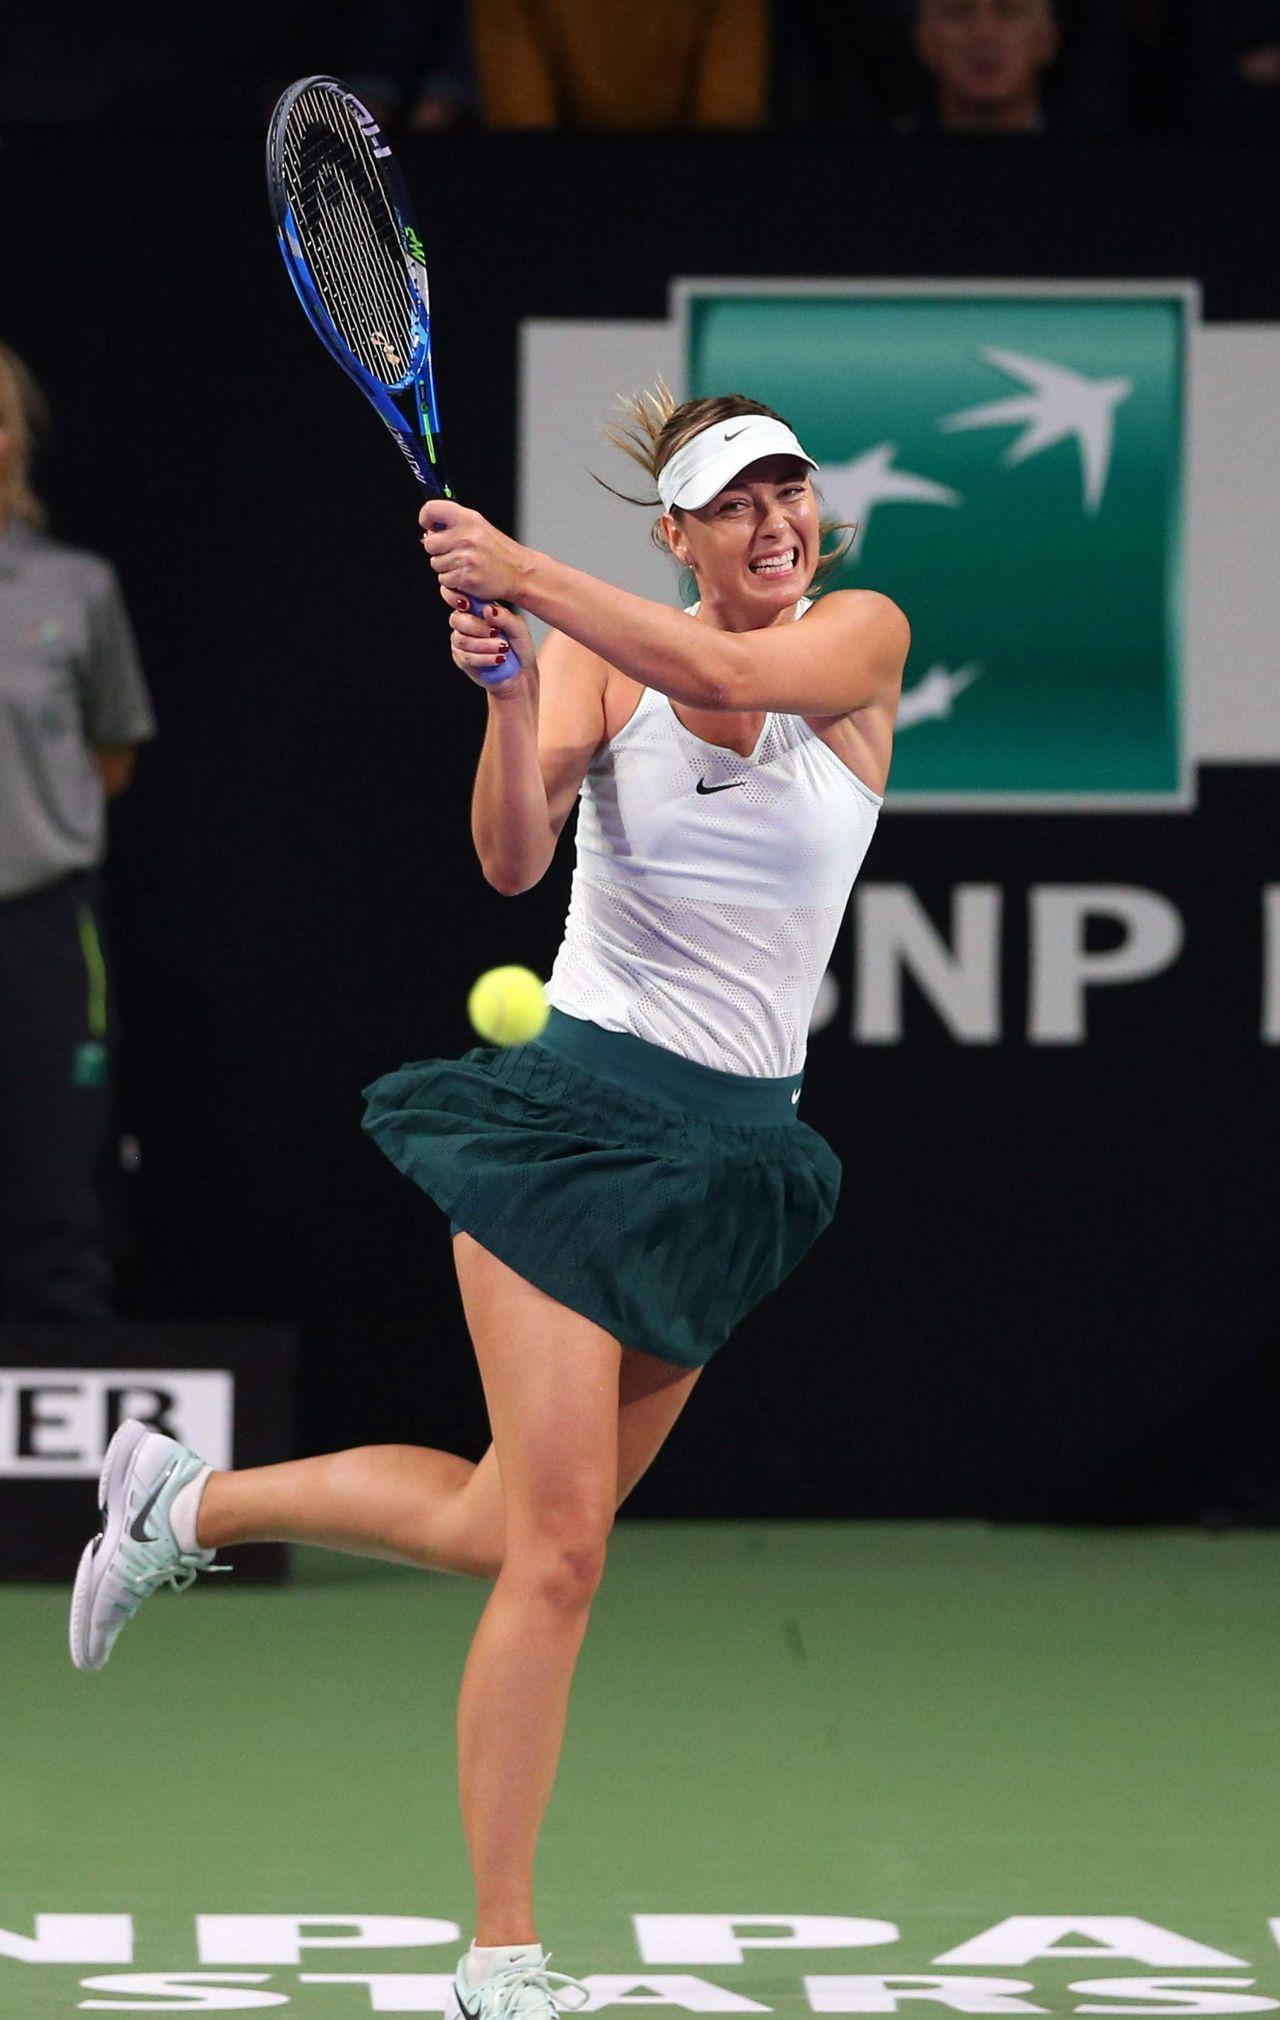 Maria Sharapova Teb Bnp Paribas Tennis Stars Series In